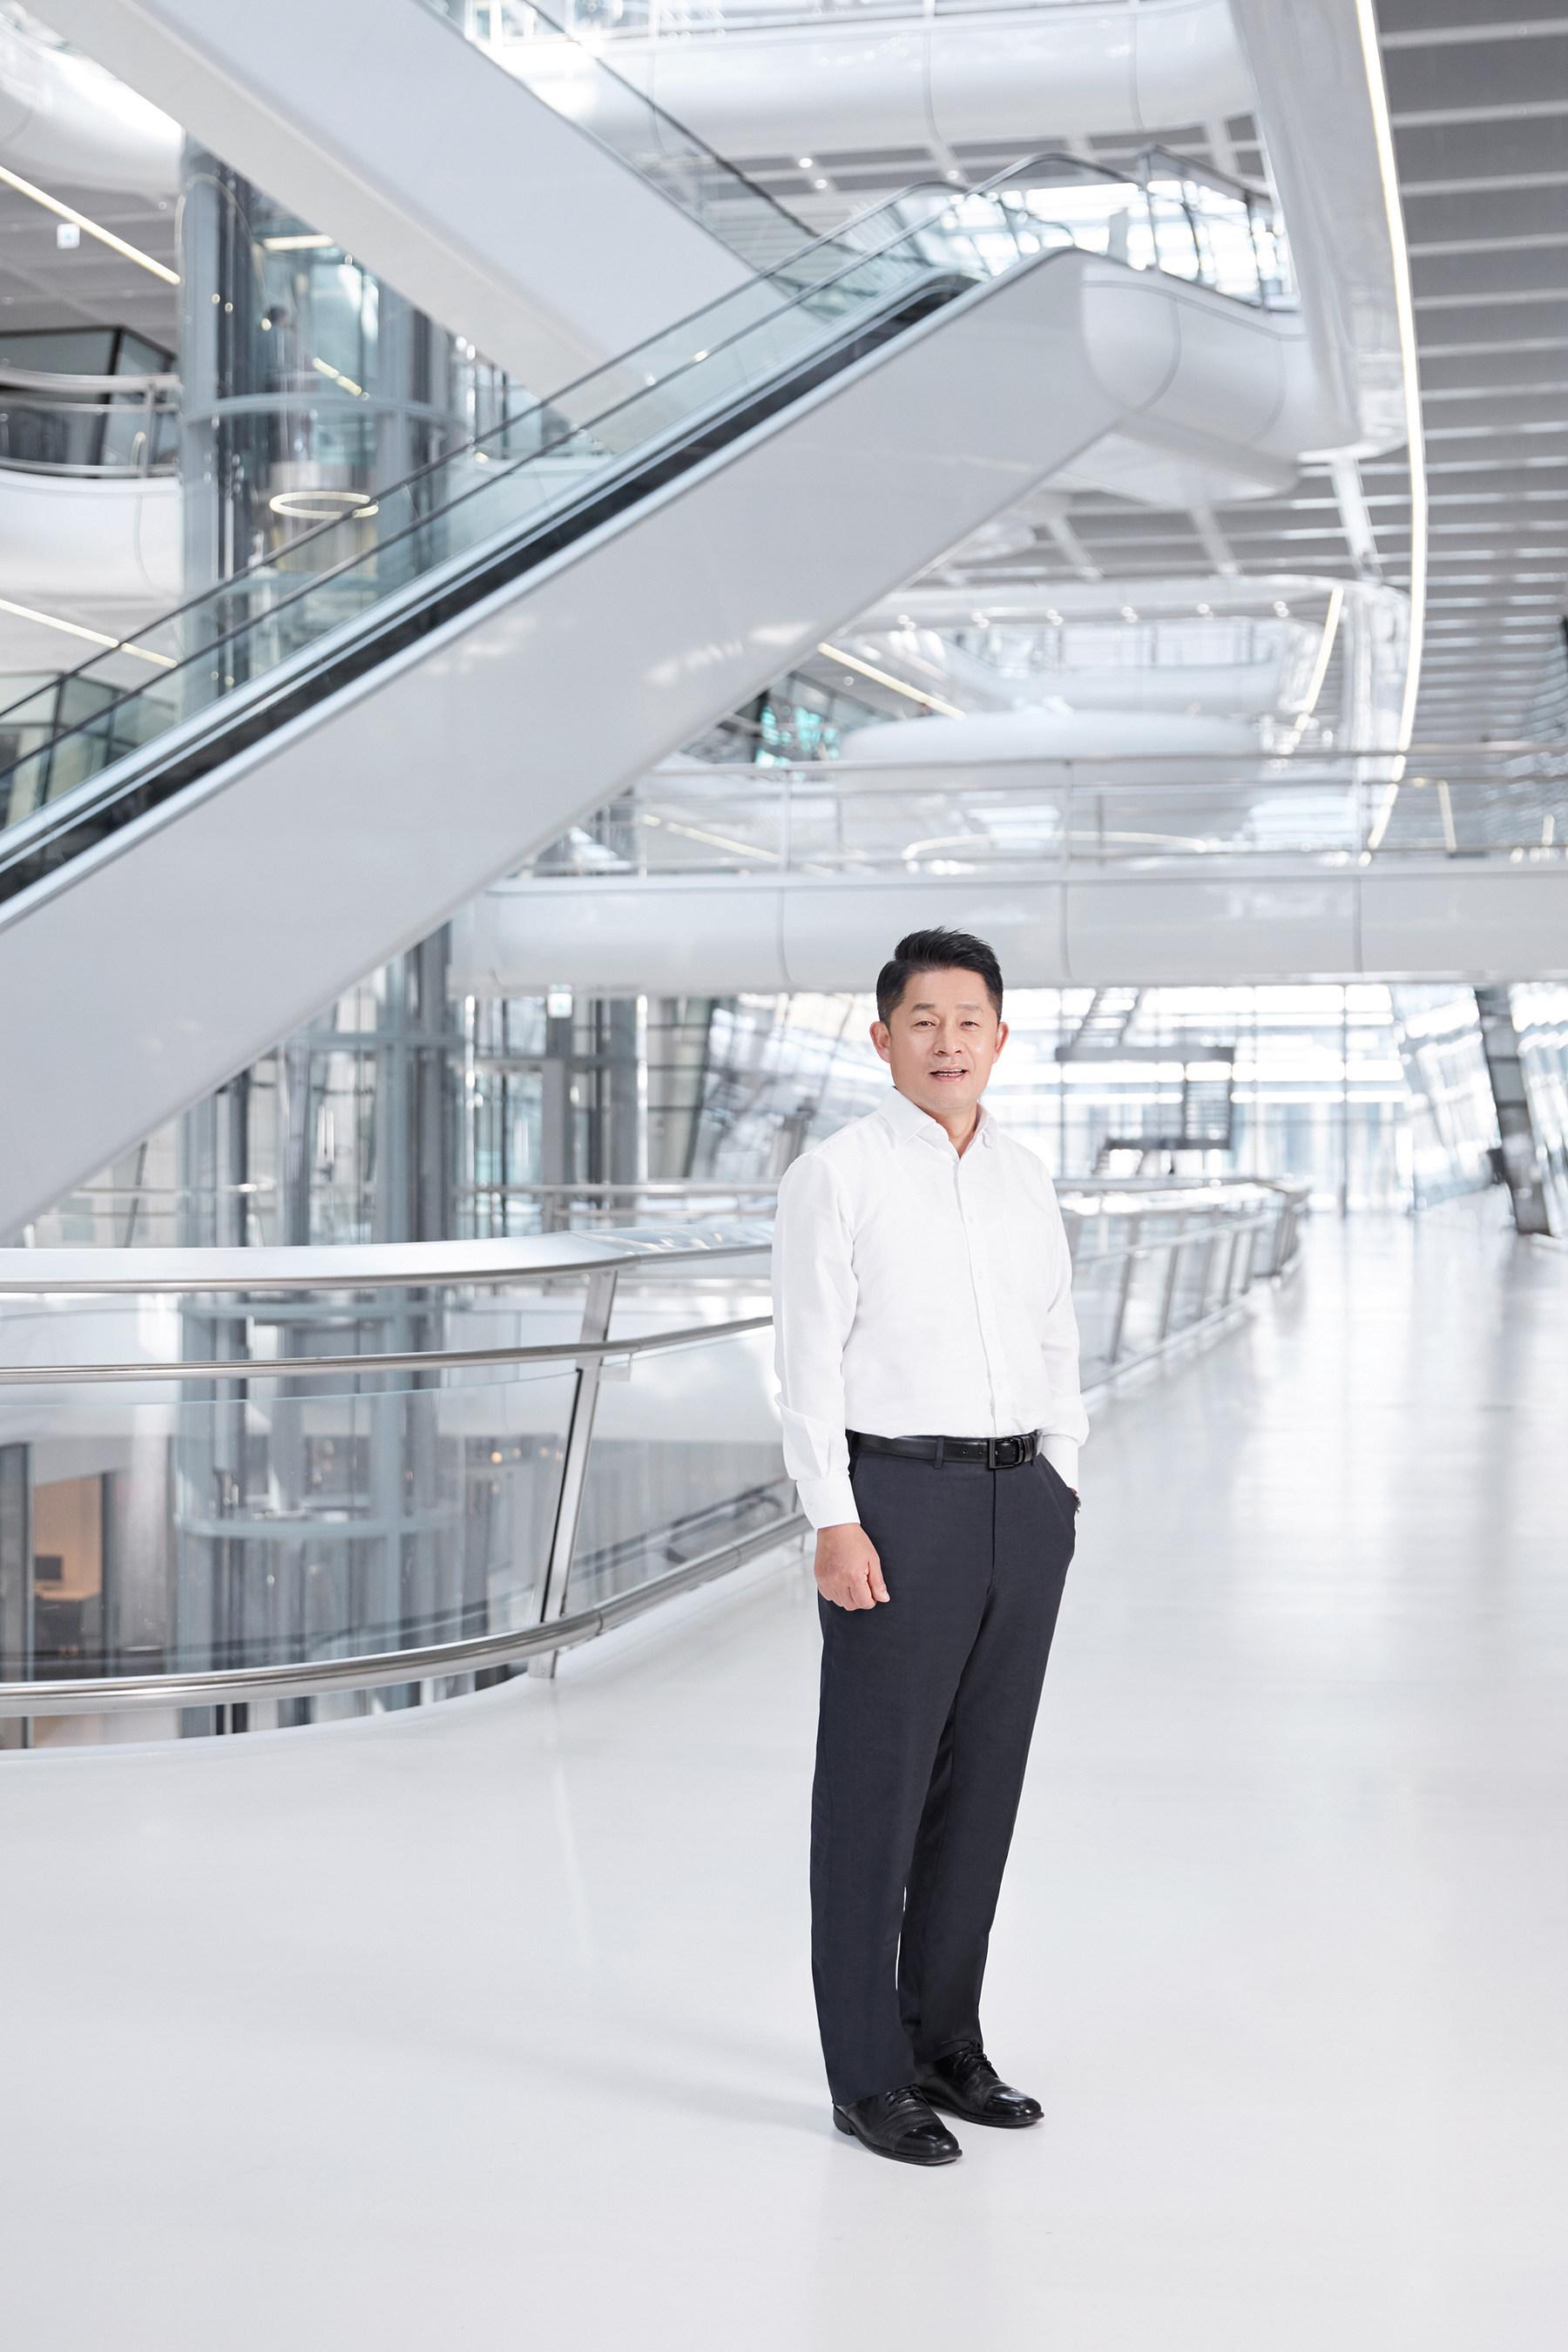 Hankook Tire America Corp. introduces Soo II Lee as new president.